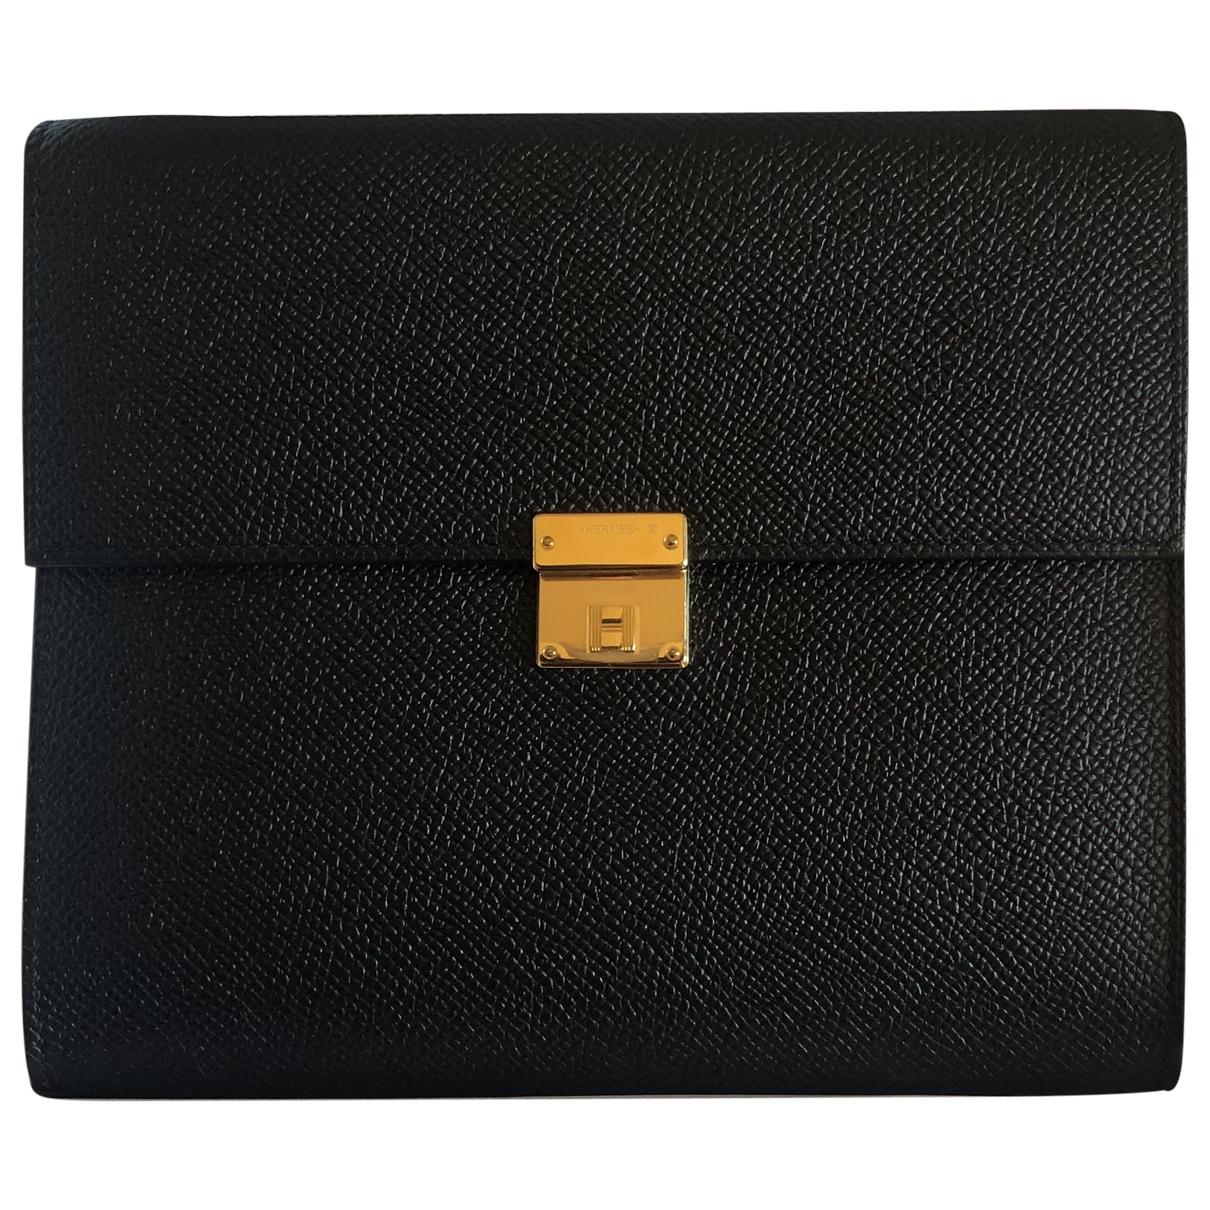 Hermès Clic 16 Black Leather handbag for Women \N